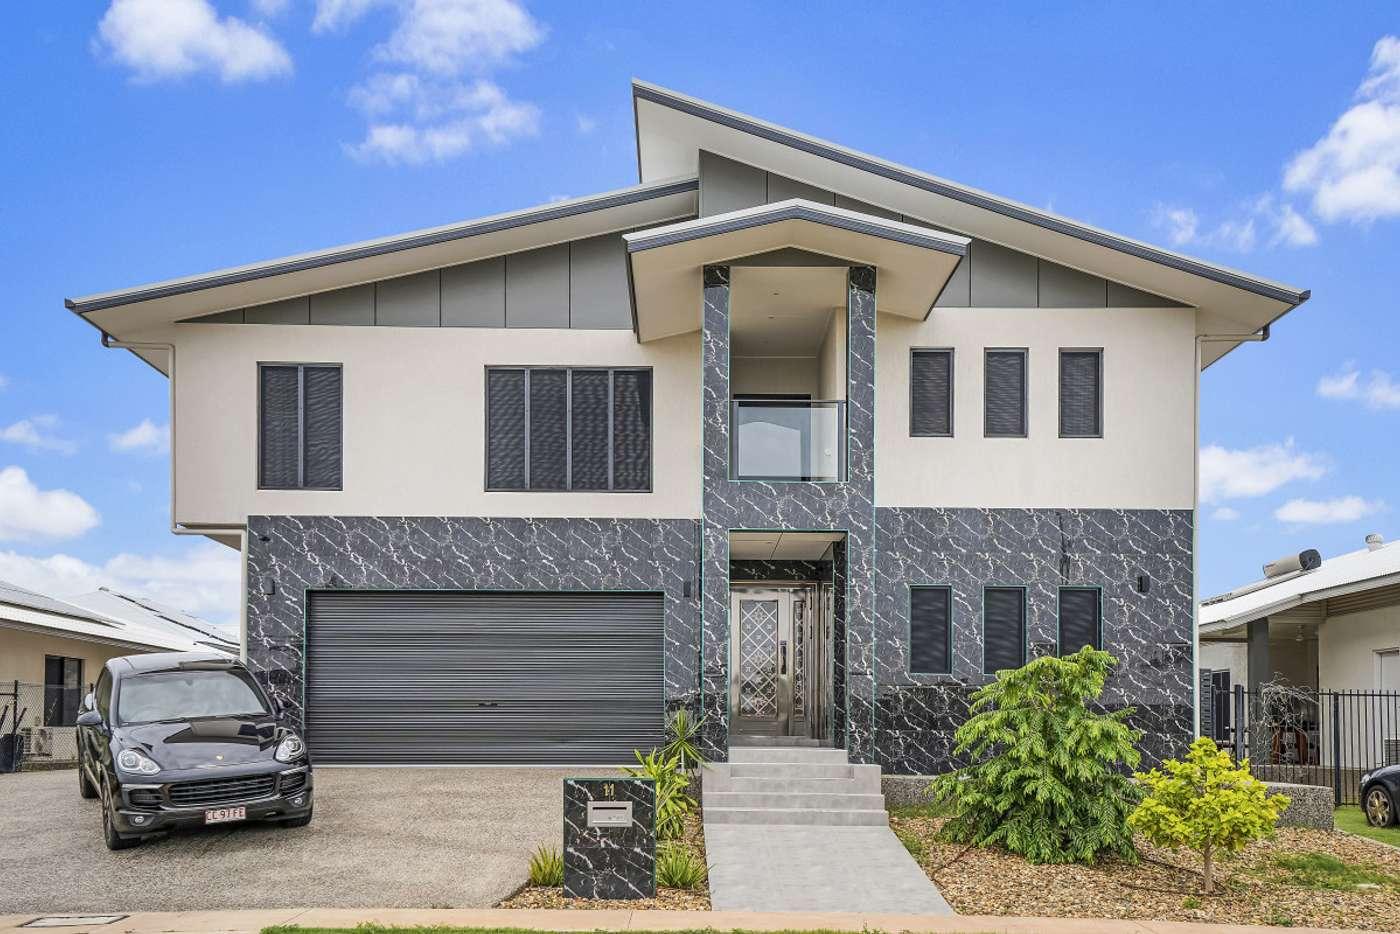 Main view of Homely house listing, 11 Samuel Street, Muirhead NT 810